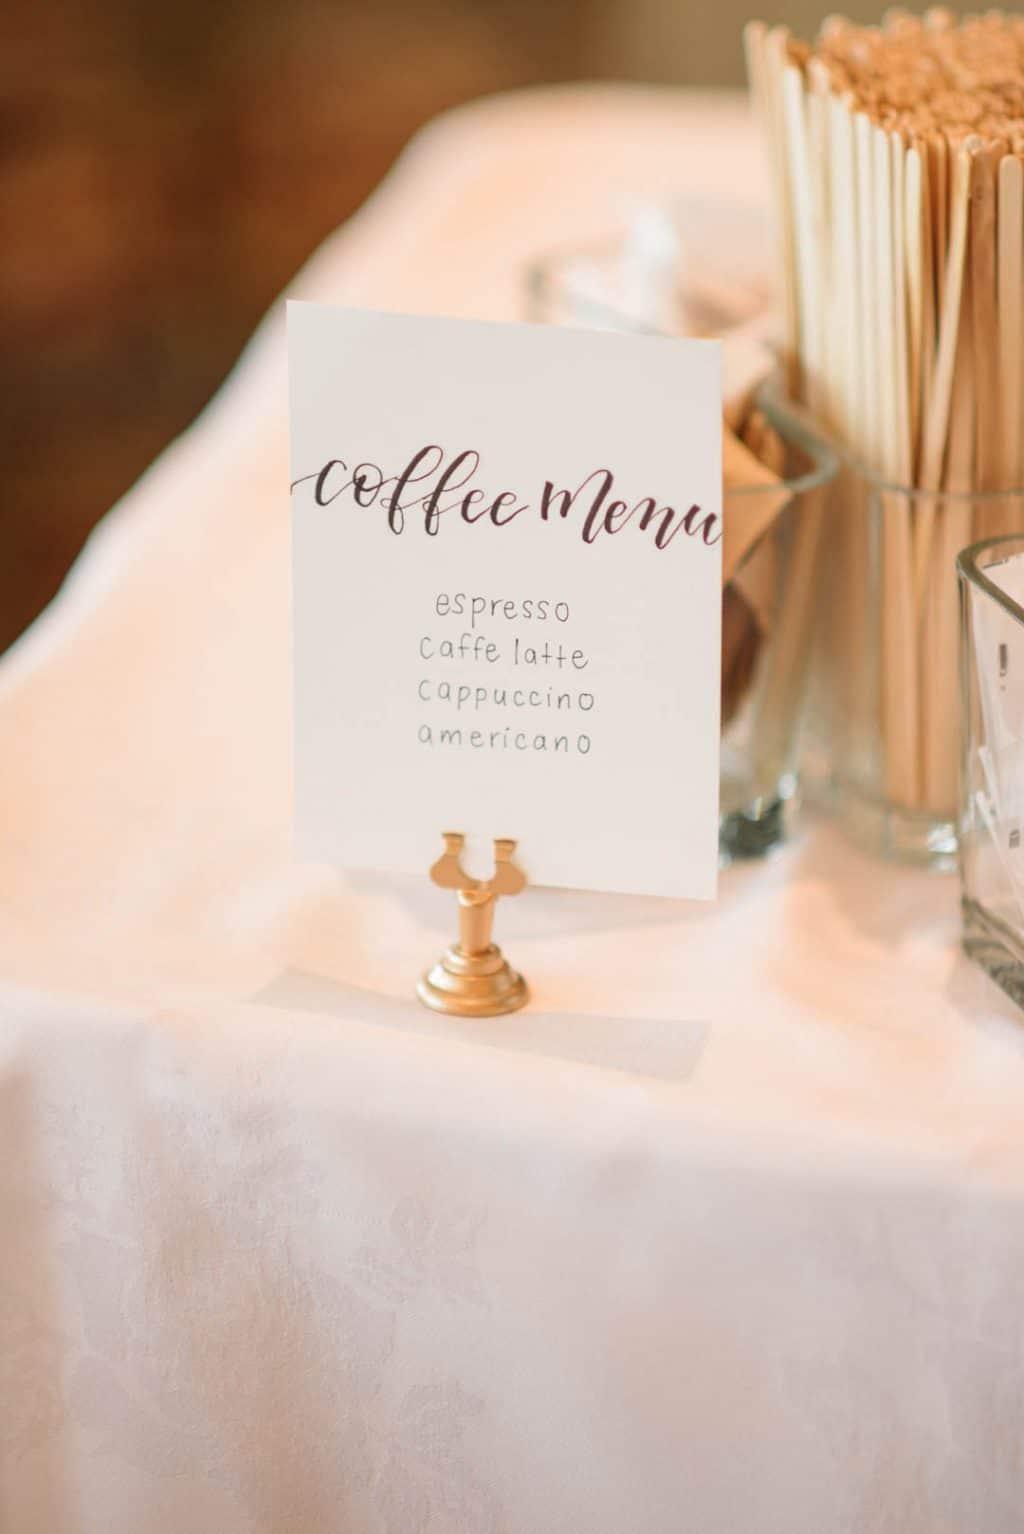 Wedding espresso bar menu